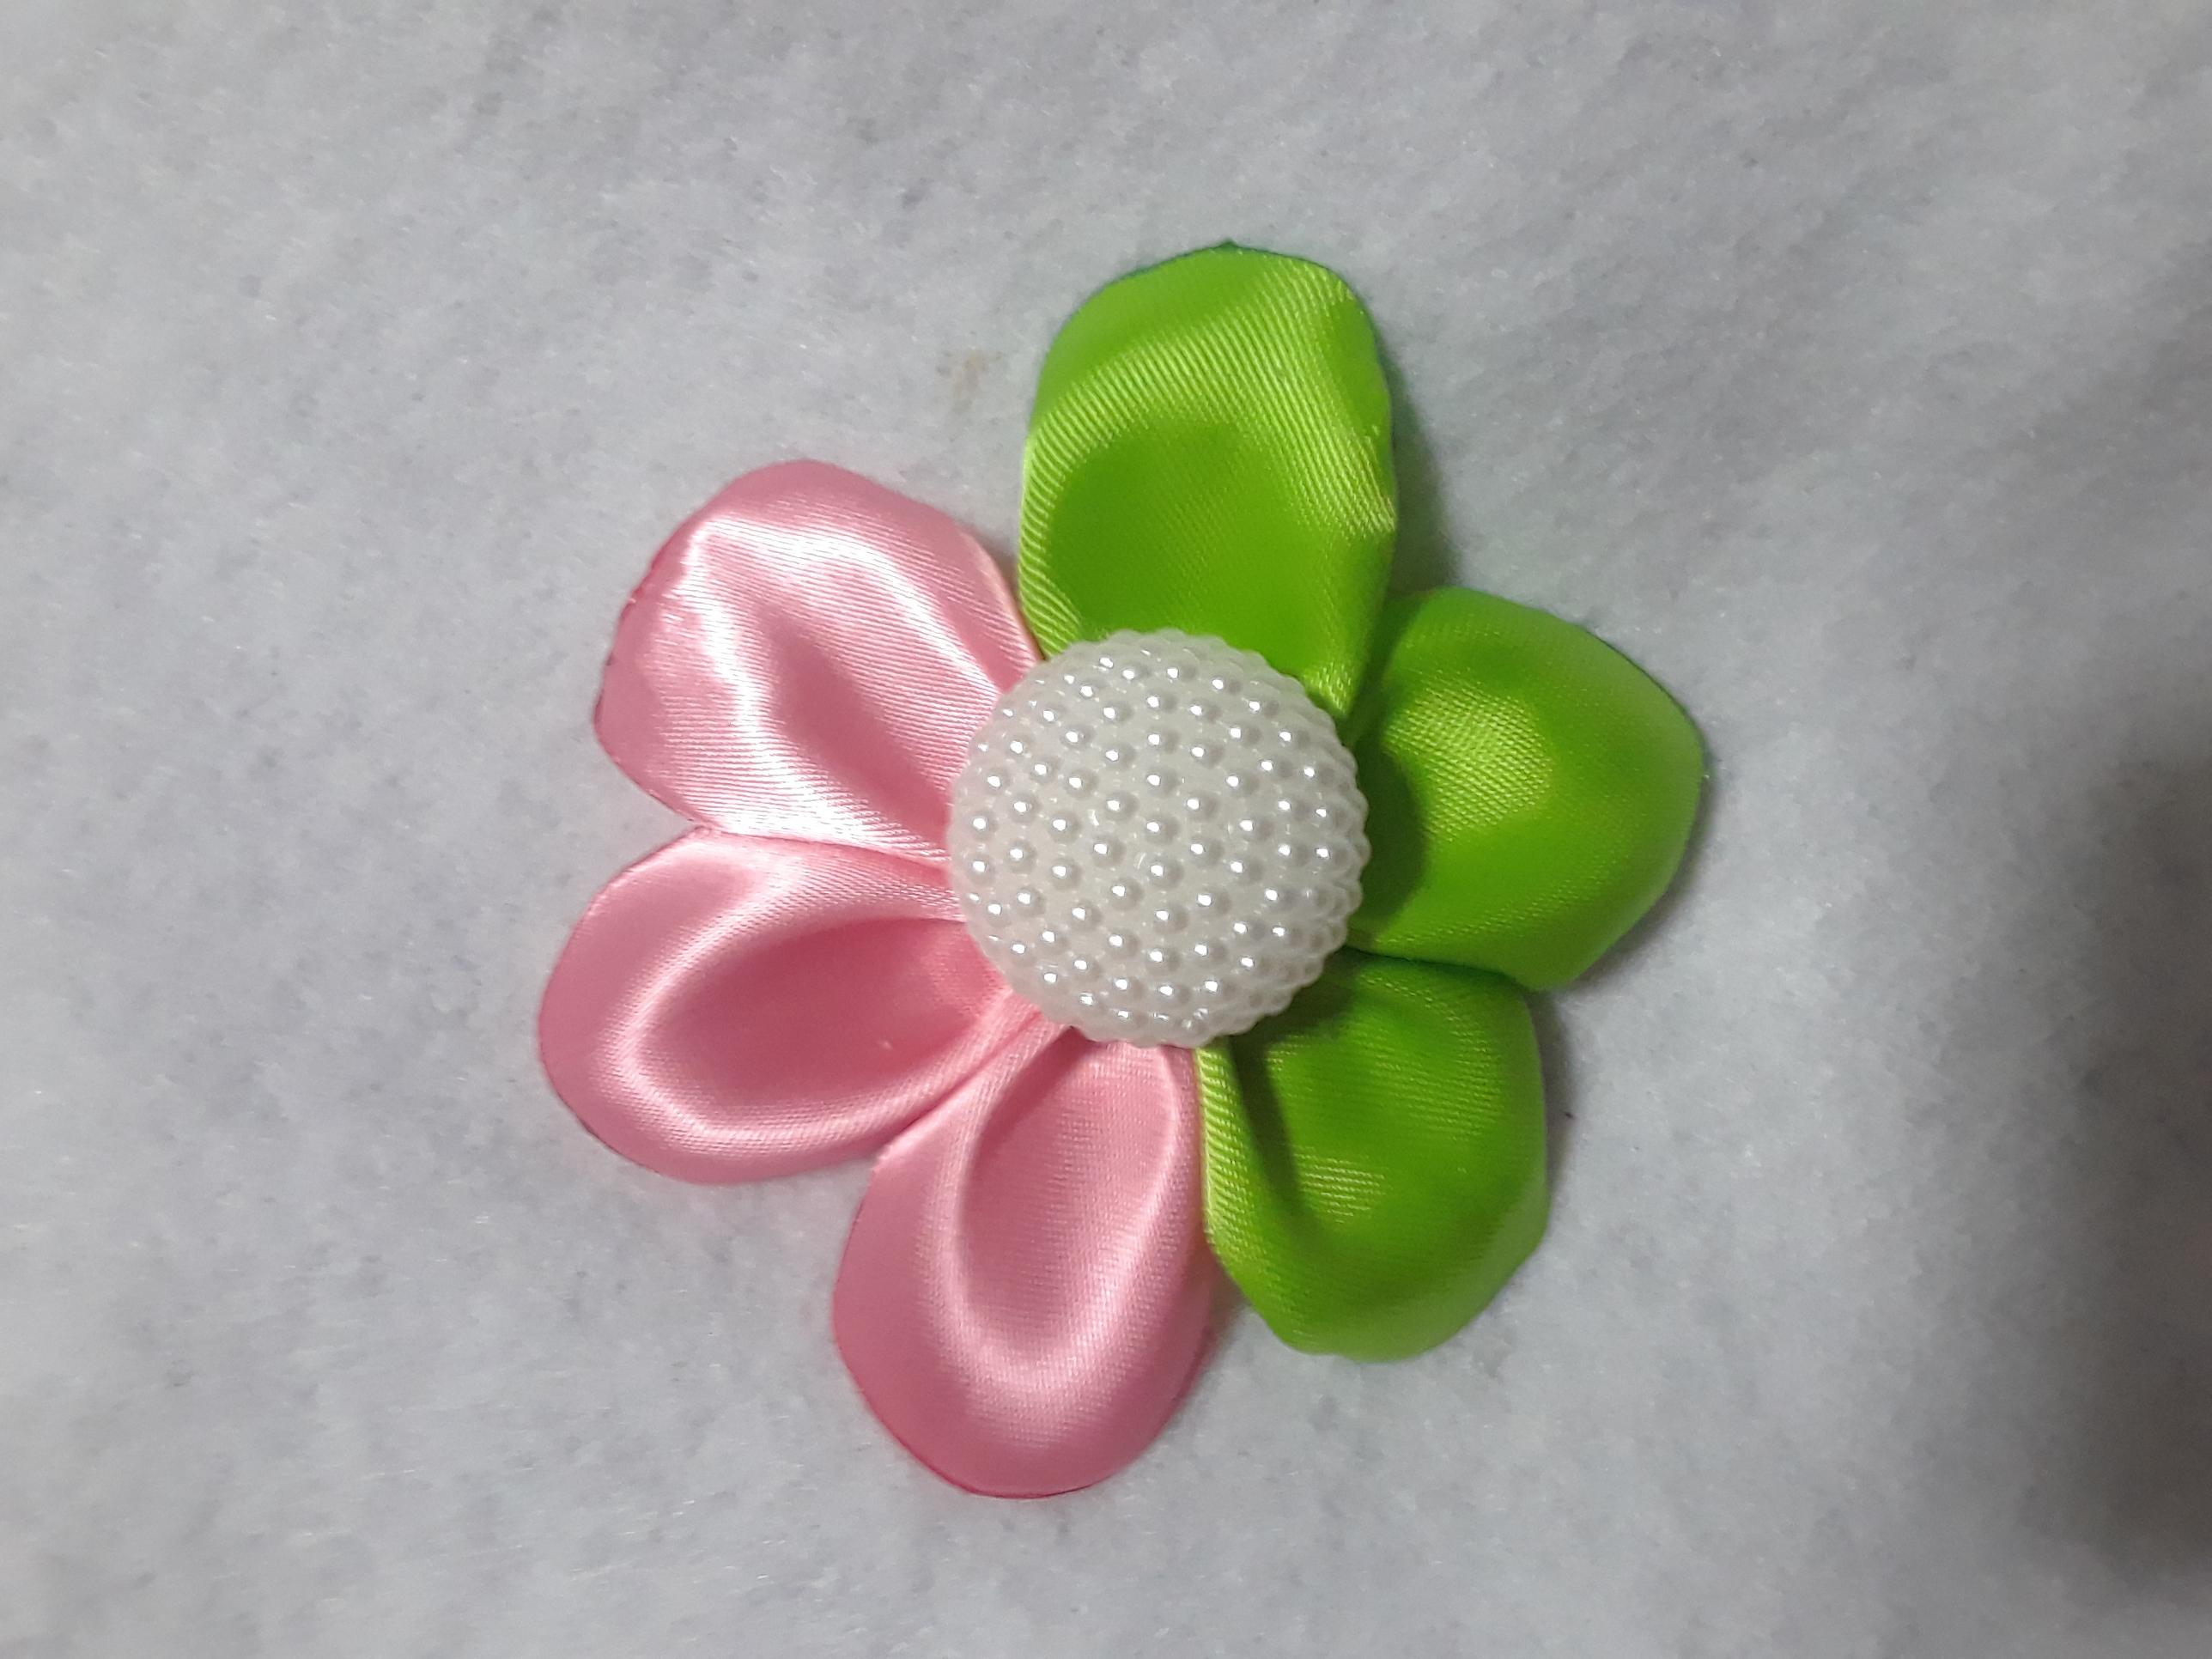 PG anemone